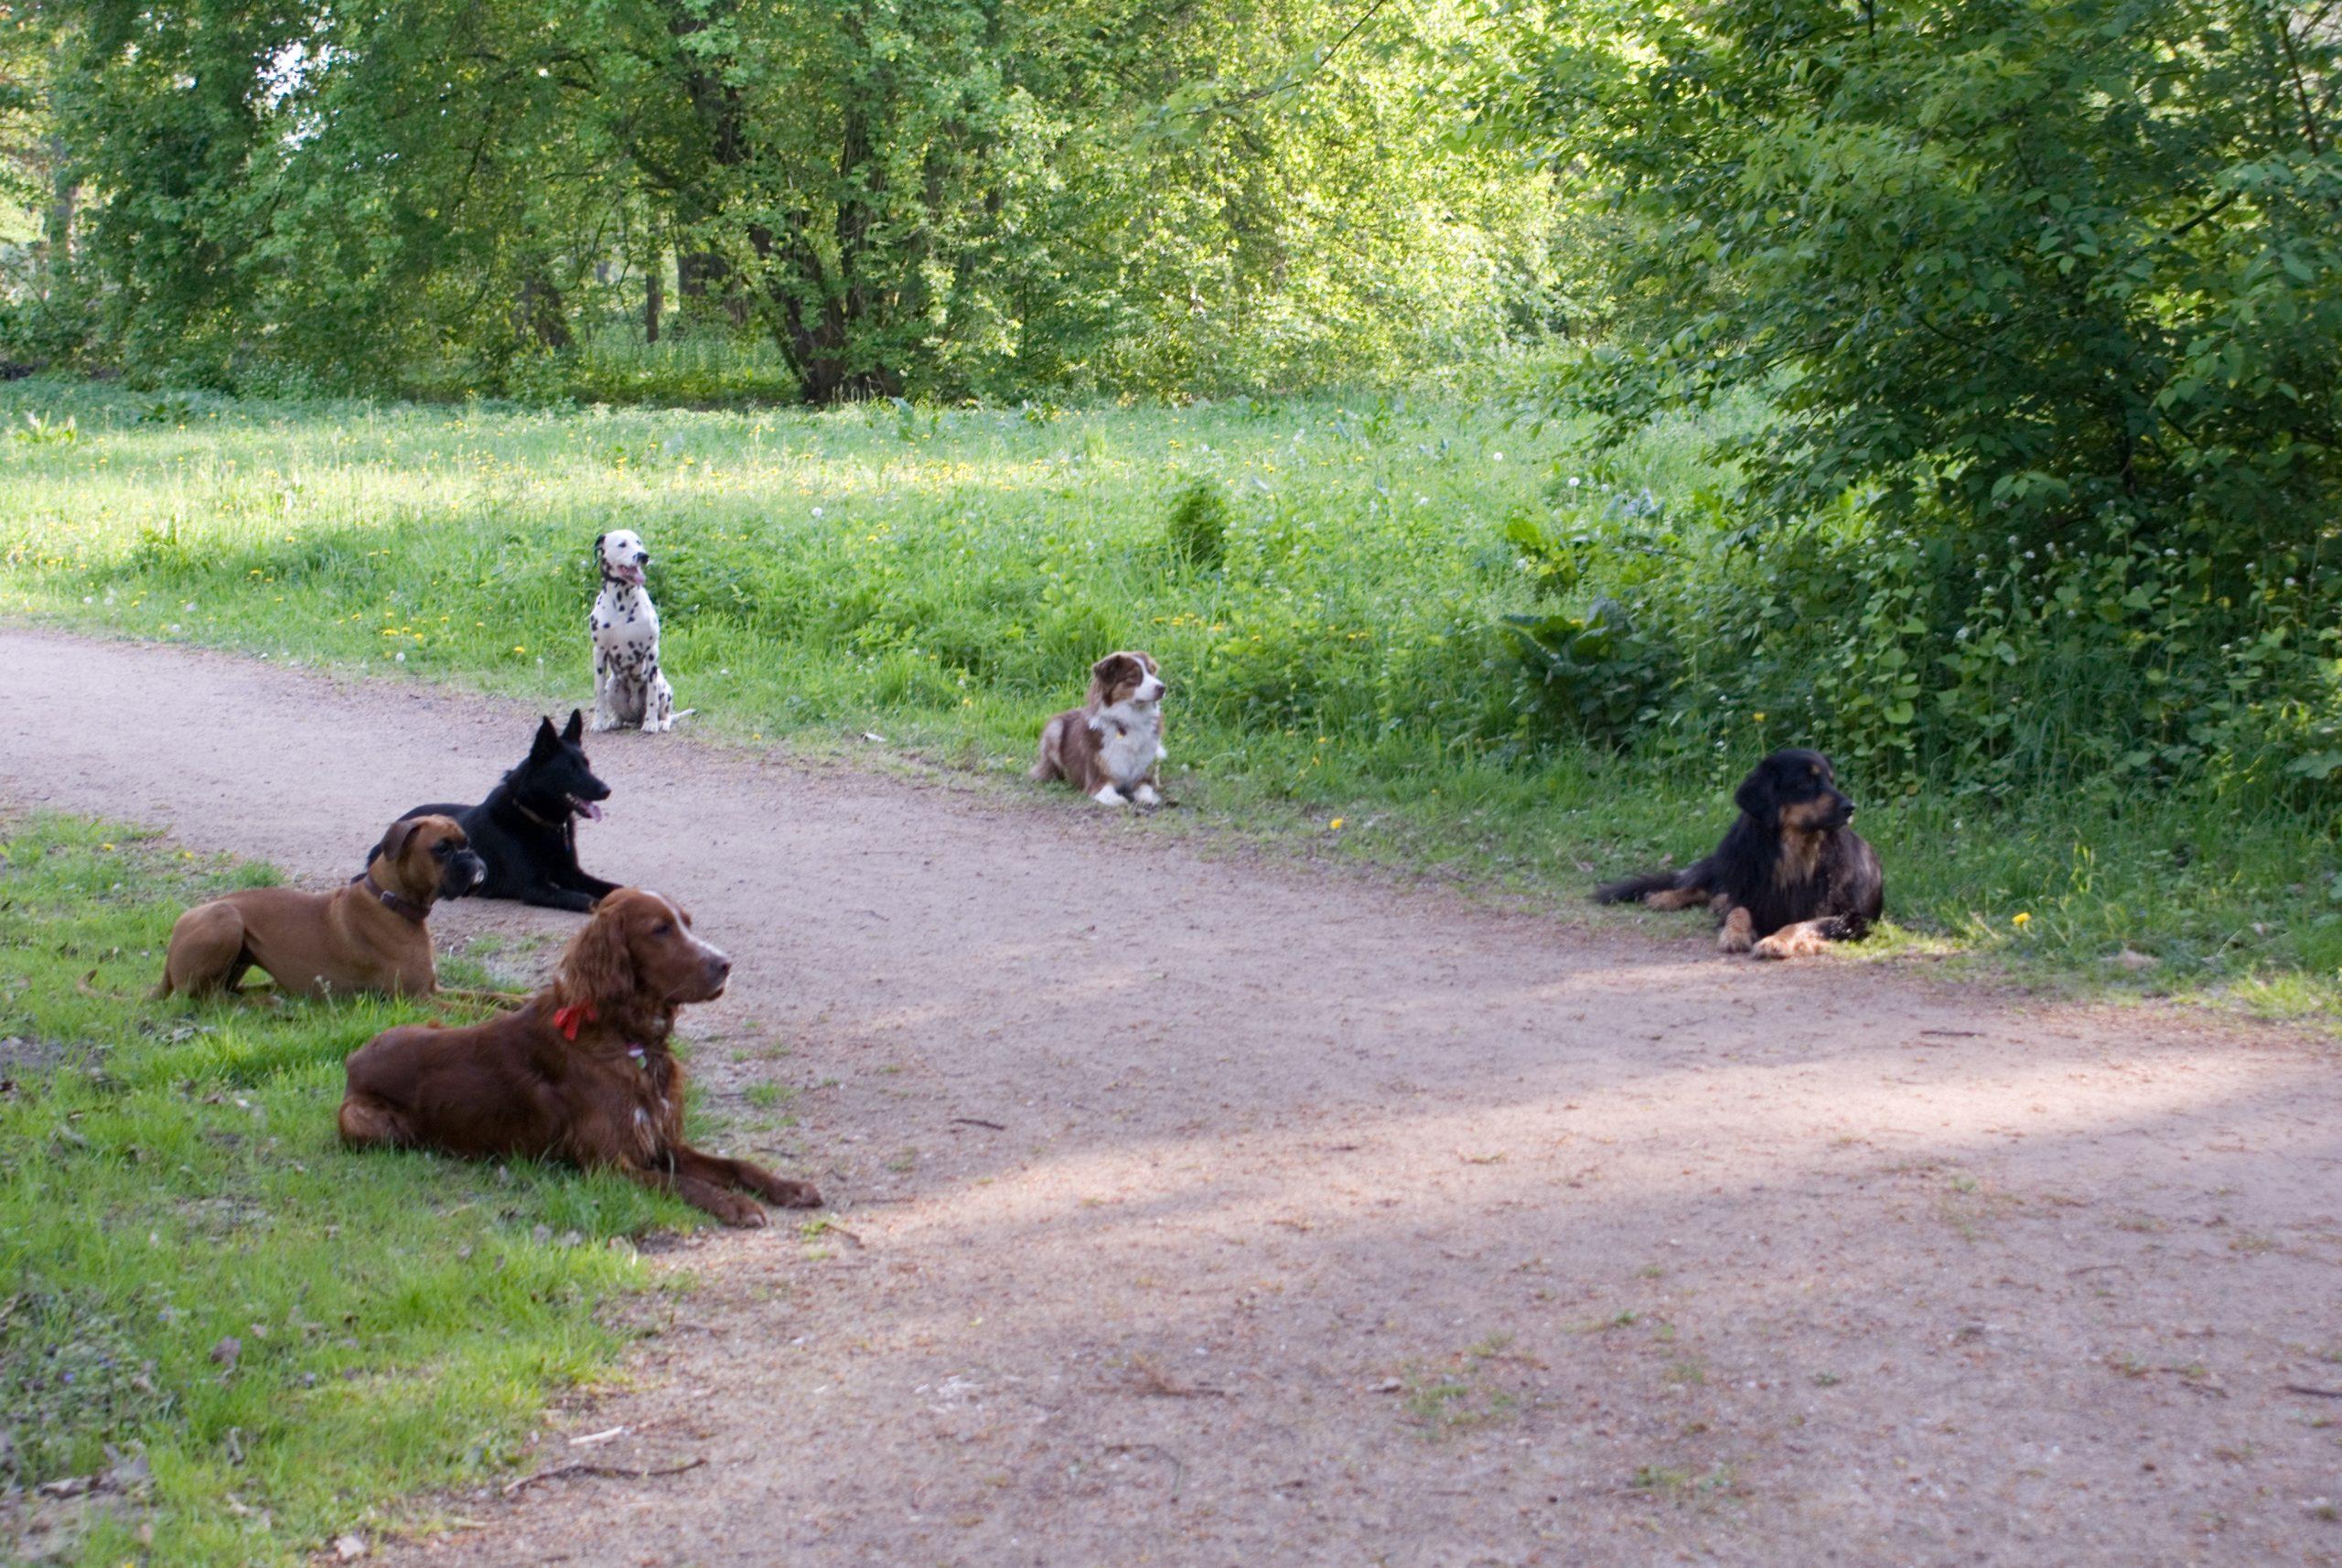 TEAMTRAINING-BREMEN.DE 2009 04 27 Hundeschule 42 scaled 1